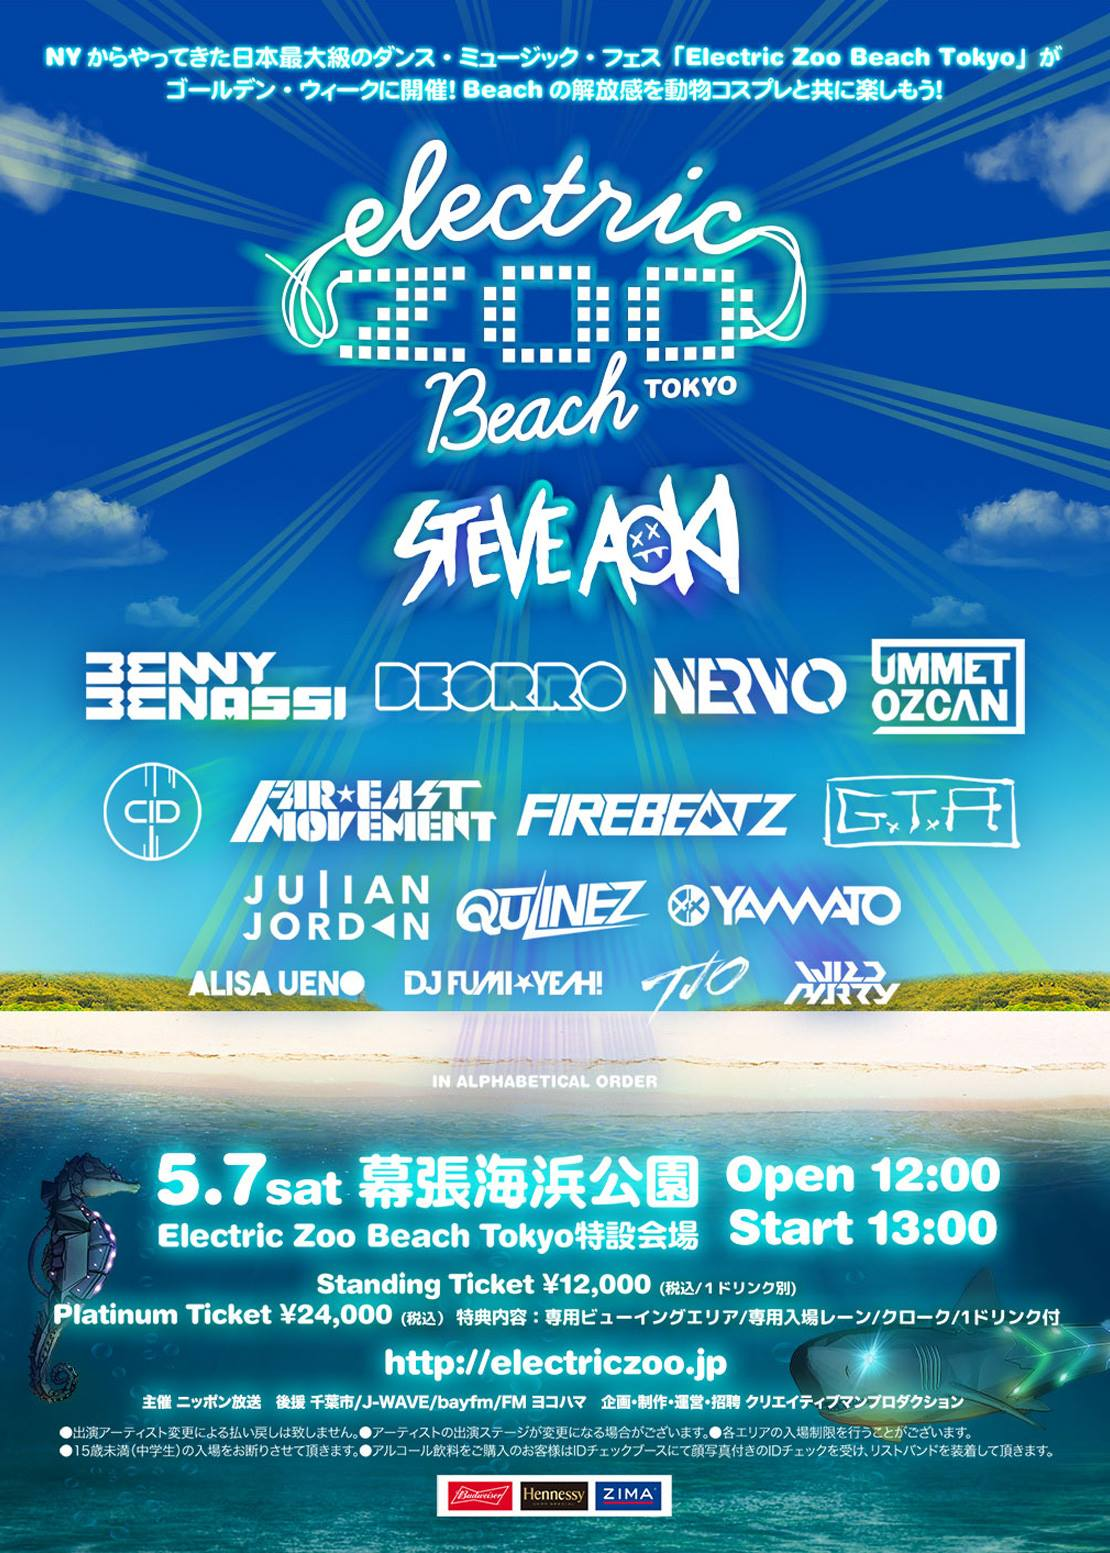 Electric Zoo Beach Tokyo lineup